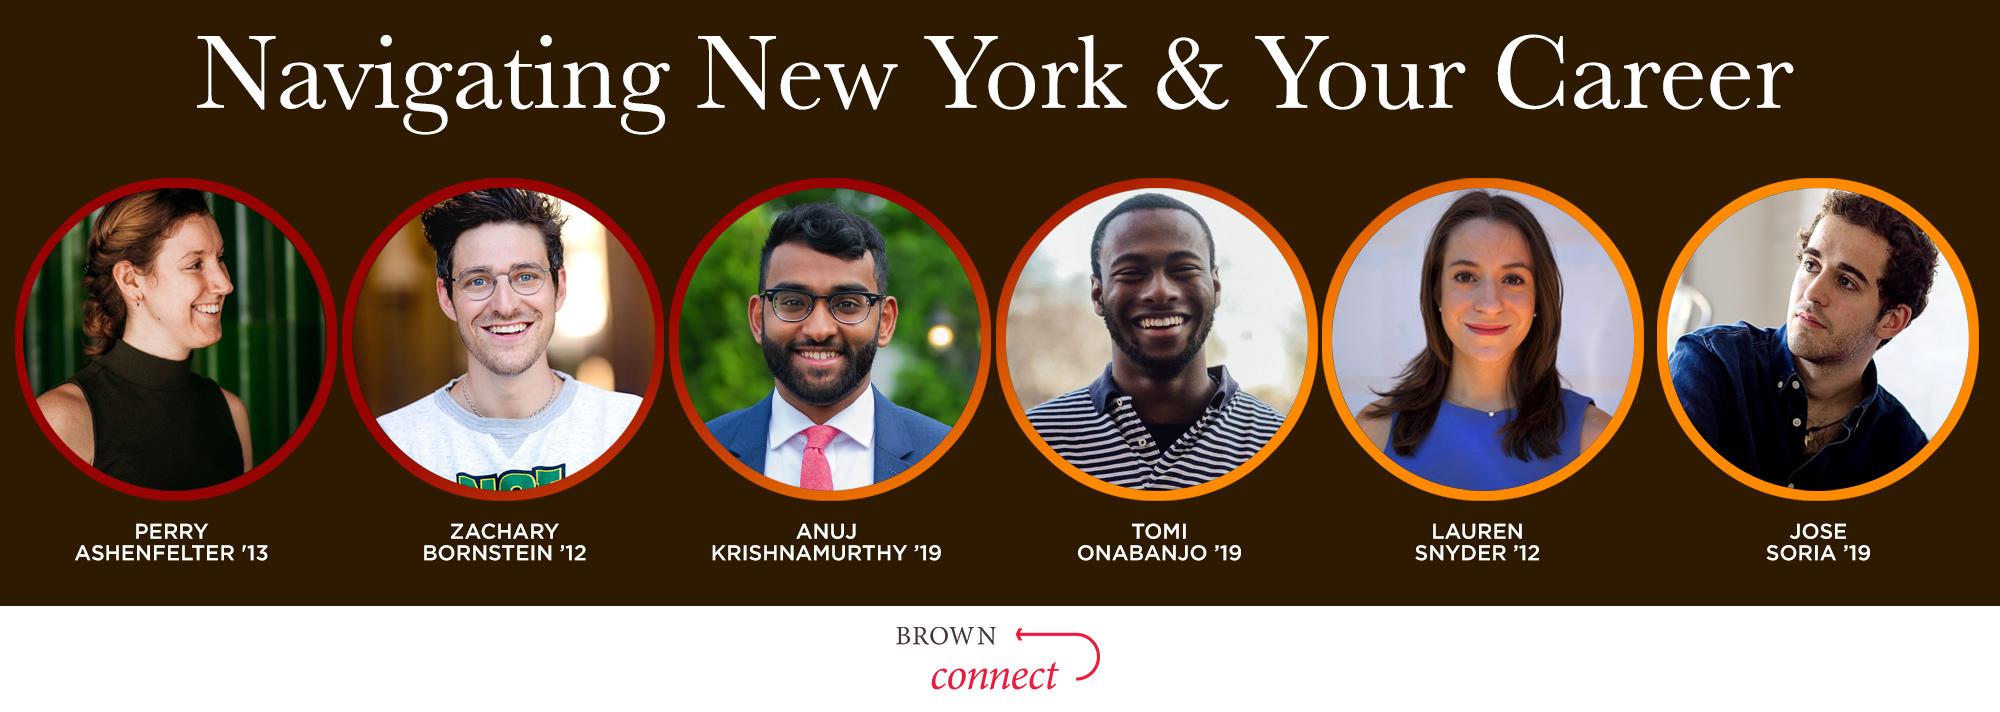 Navigating New York & Your Career